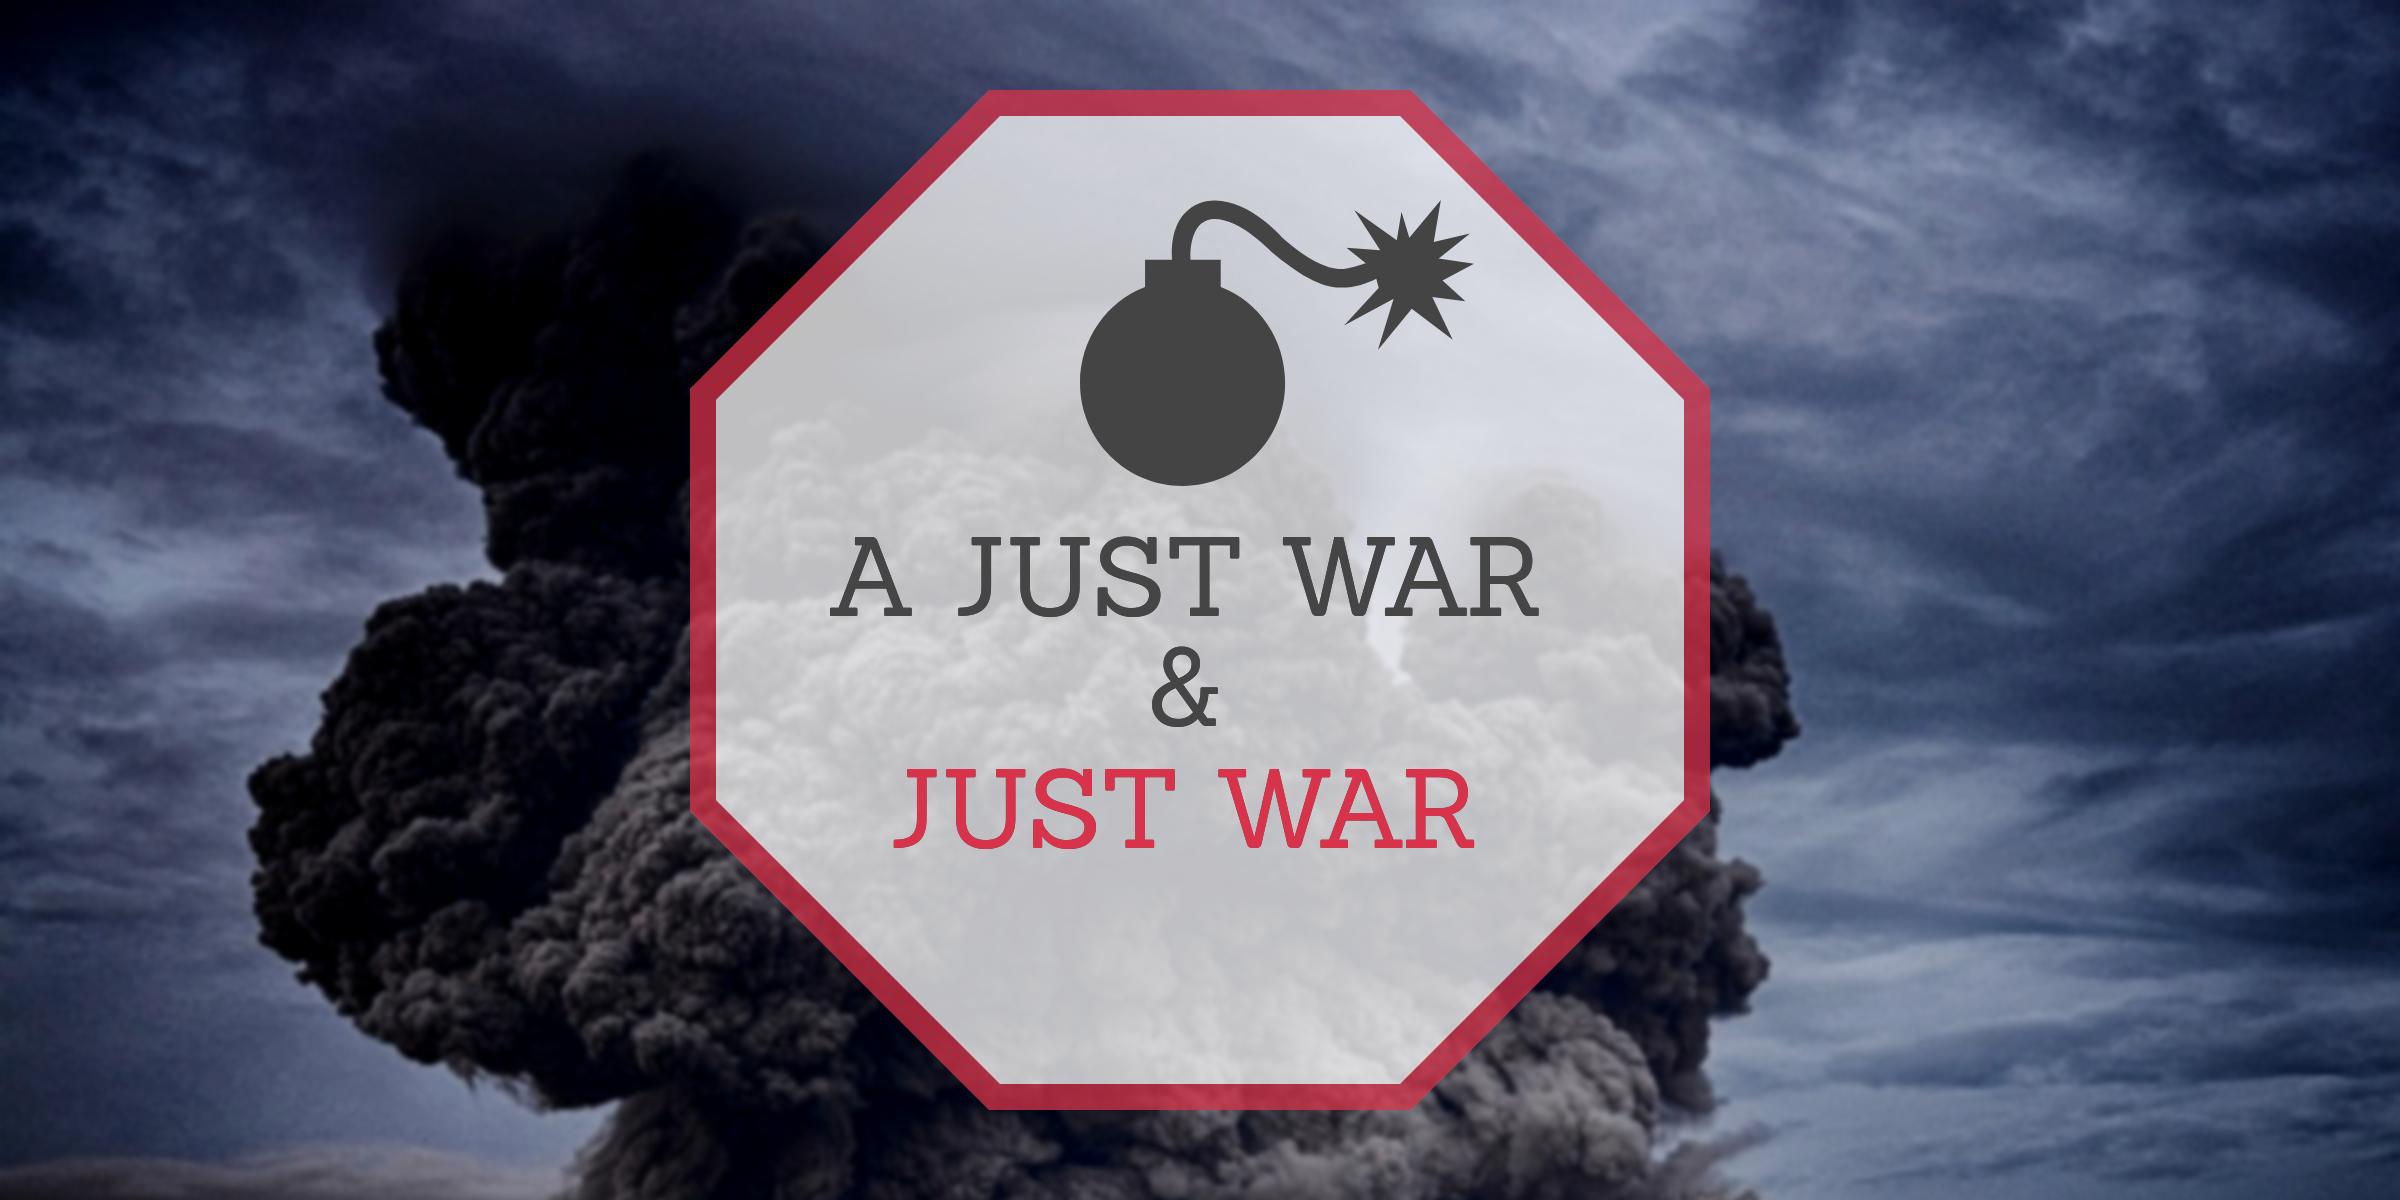 A Just War and Just War